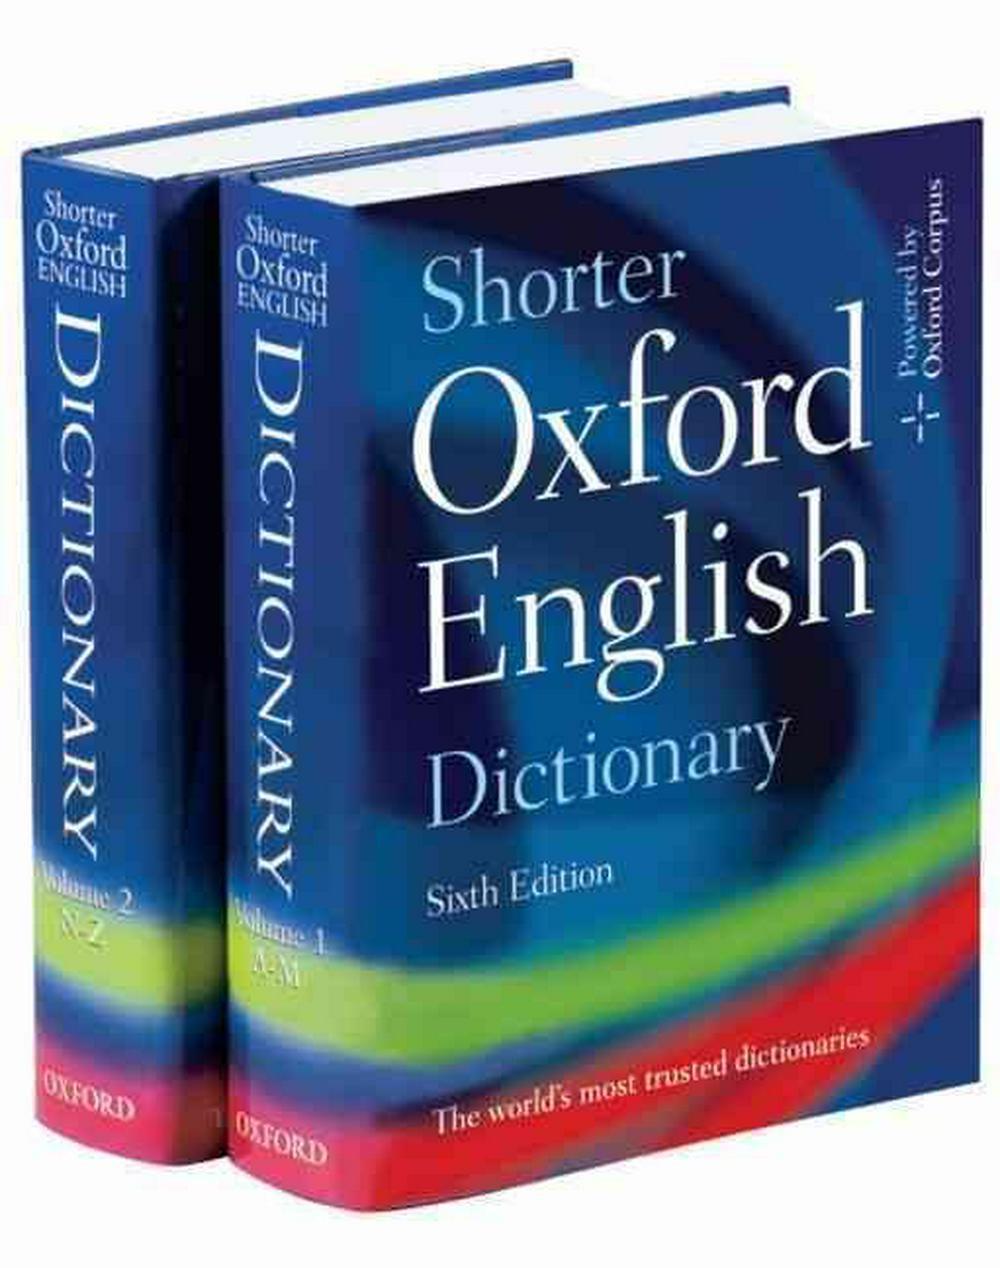 Hardcover Oxford Dictionary £2 (Broughton retail park) WHSmith